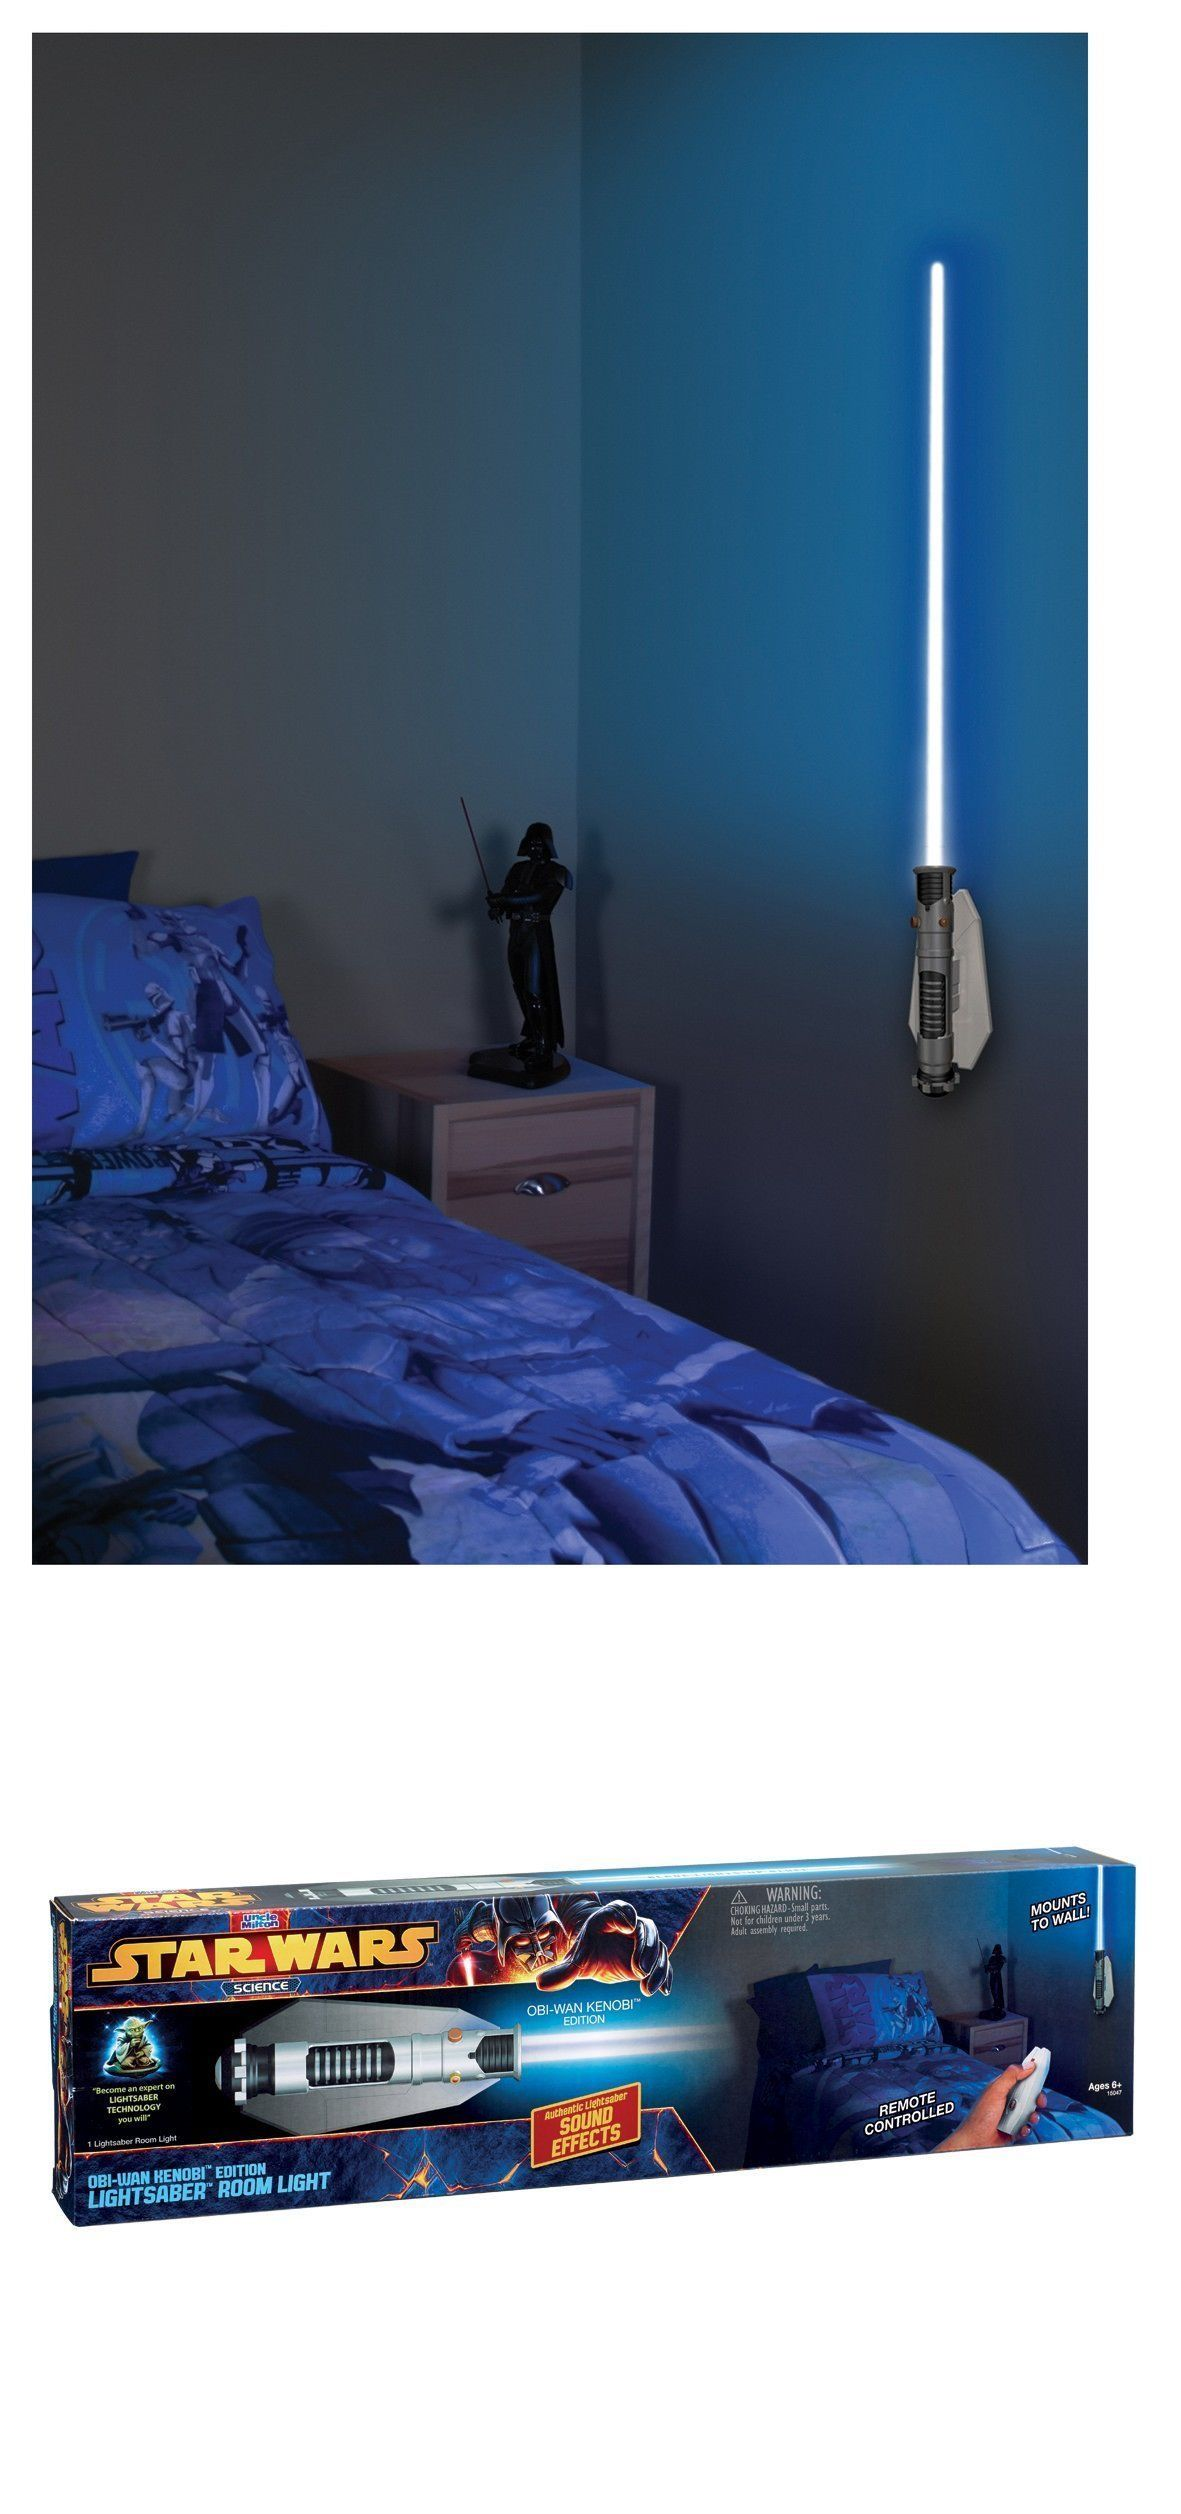 Other Battery Op Toys 1990 Now 38287 Uncle Milton Star Wars Science Obi Wan Kenobi Lightsaber Room Light Star Wars Room Room Lights Star Wars Light Saber